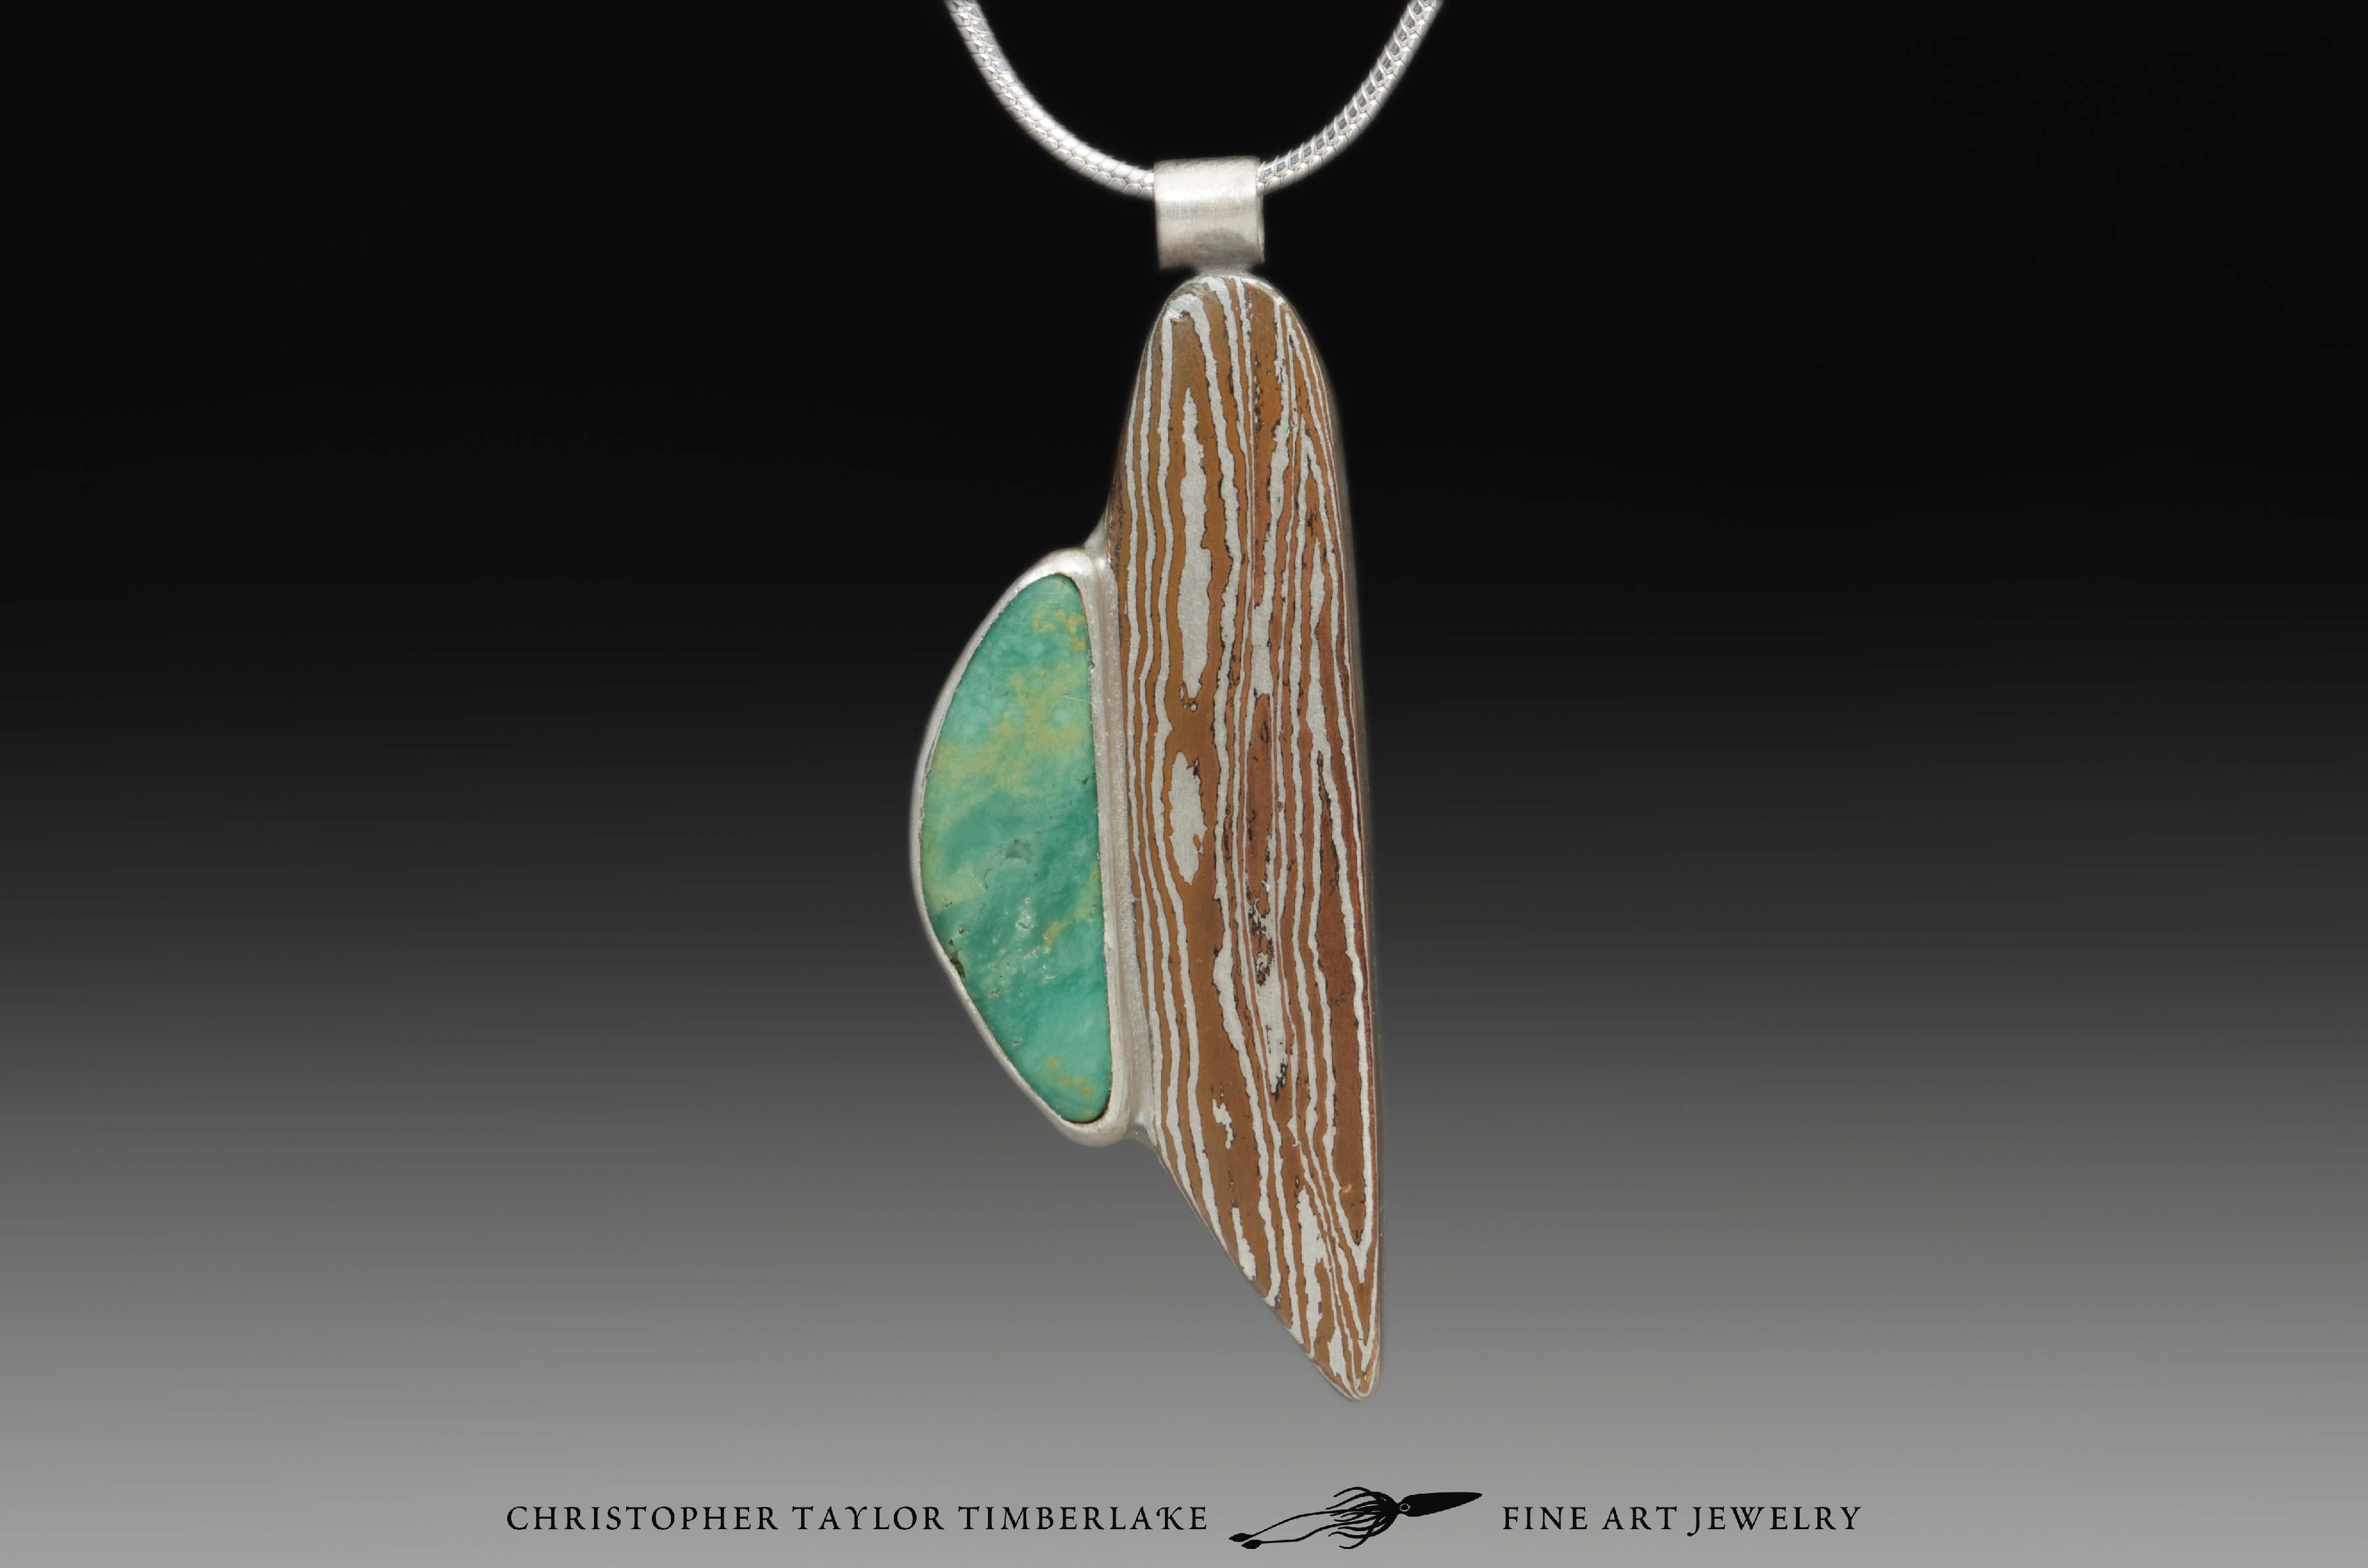 Mokum mokume gane pendant m54 sterling silver copper green mokume gane pendant mokum necklace with sterling silver and green turquoise cabochon aloadofball Gallery